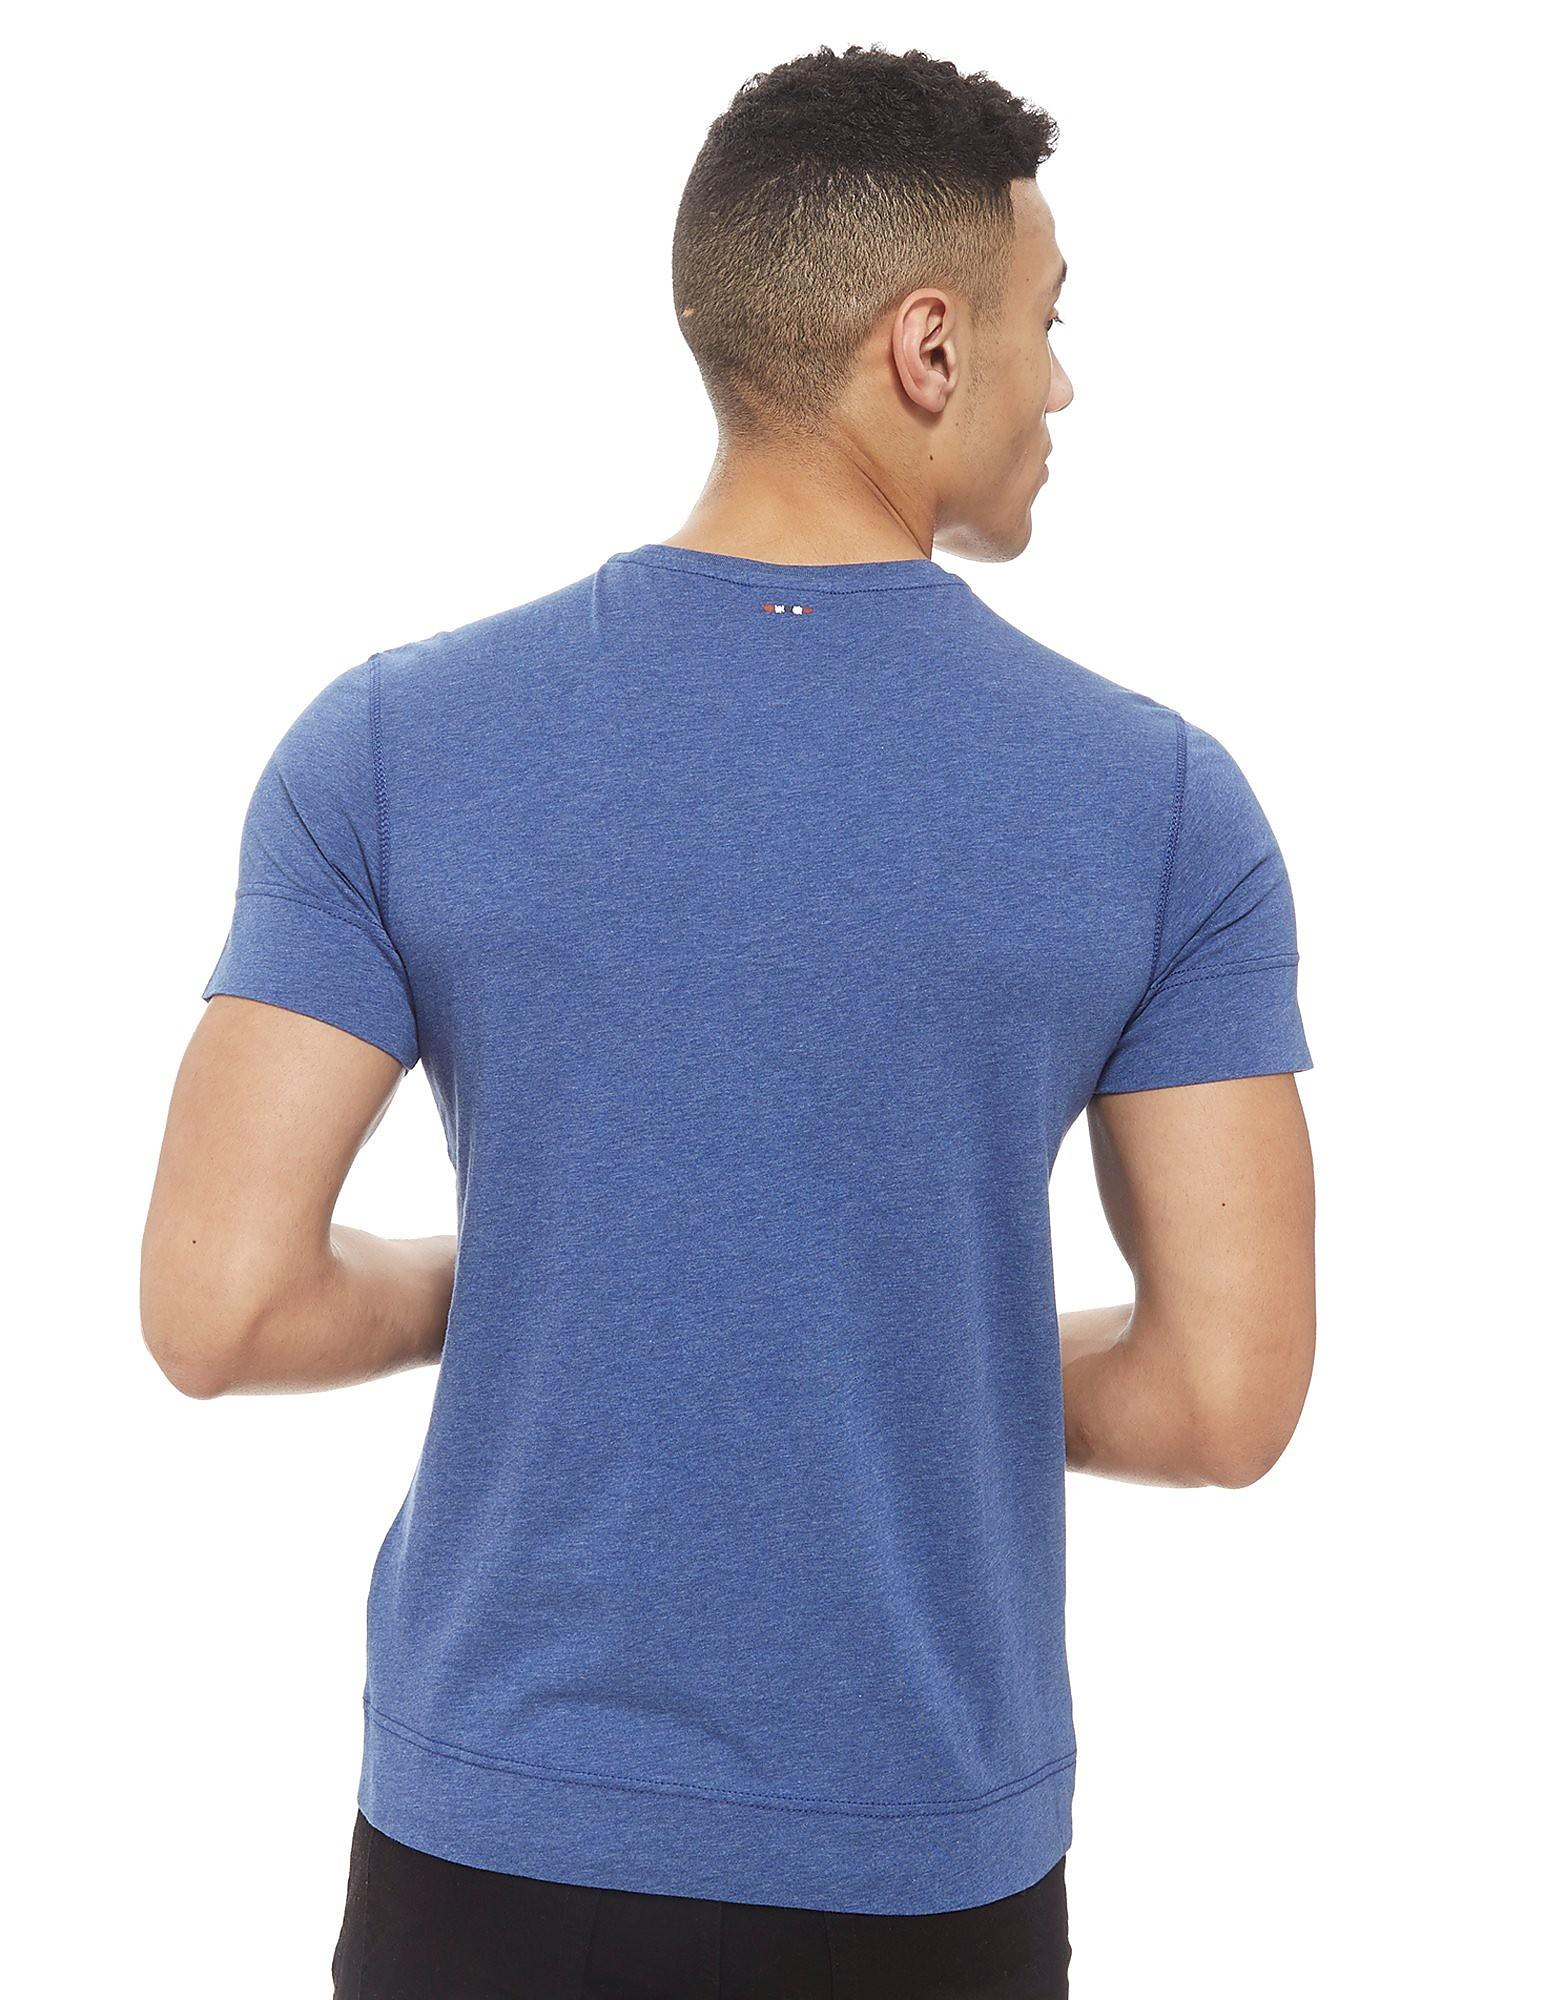 Napapijri Short Sleeve T-Shirt